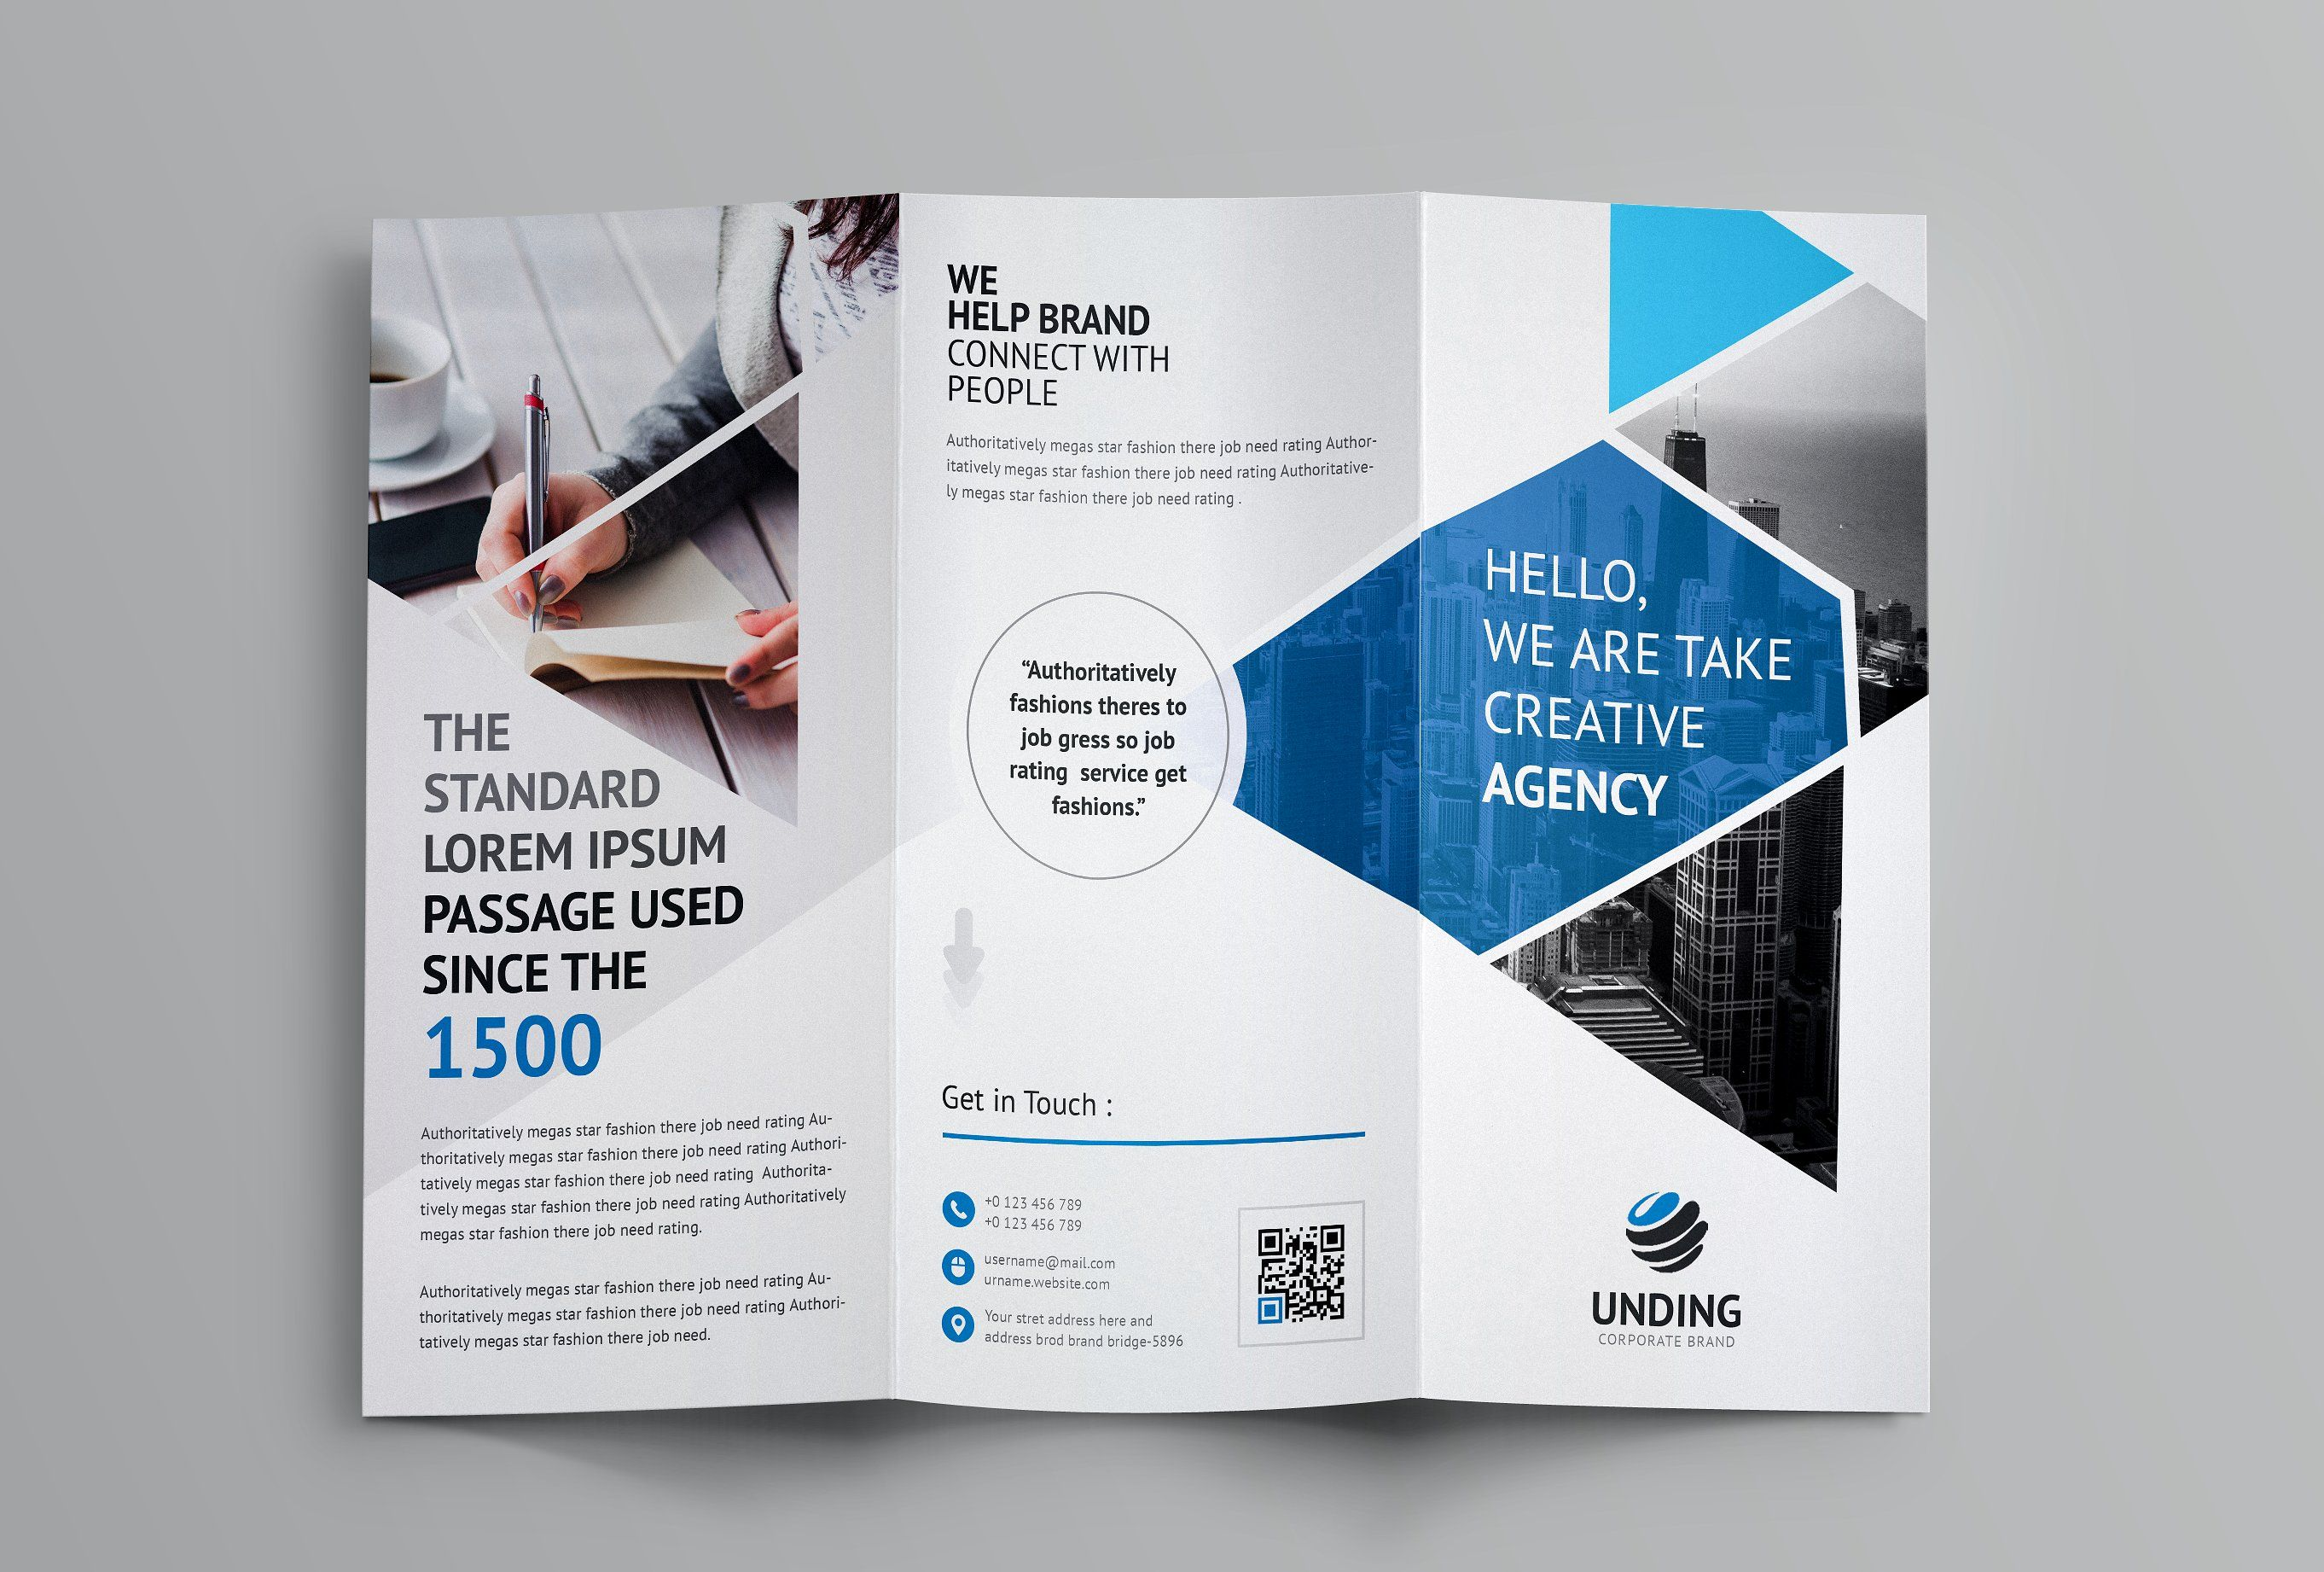 Tri Fold Brochure Trifold Brochure Template Brochure Template Trifold Brochure Template for tri fold brochure